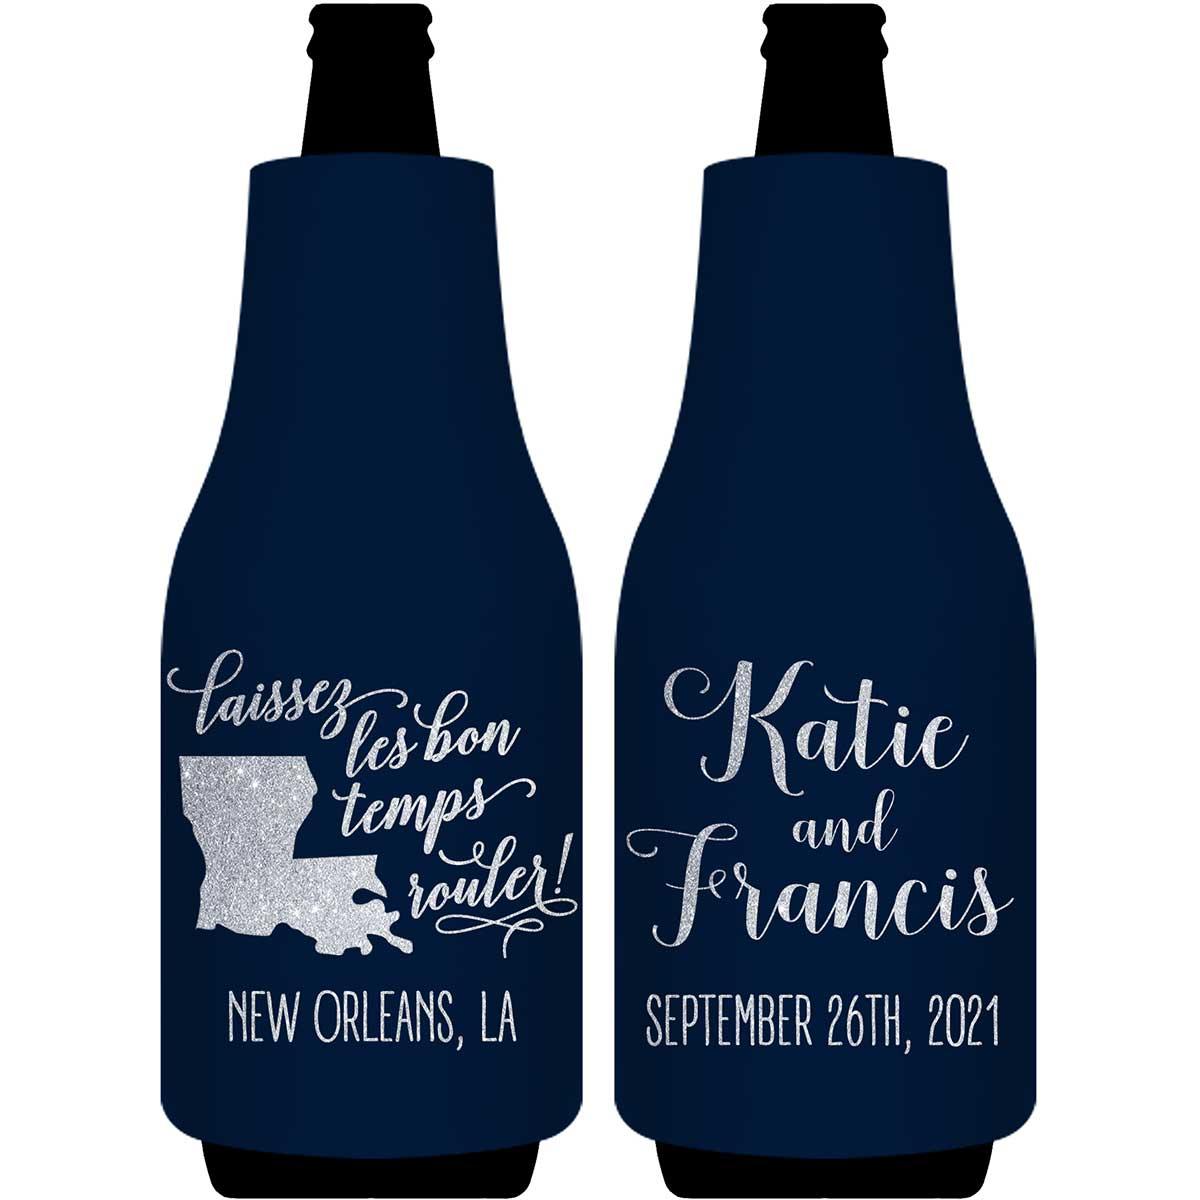 Laissez Les Bon Temps Rouler 2A Foldable Bottle Sleeve Koozies Wedding Gifts for Guests